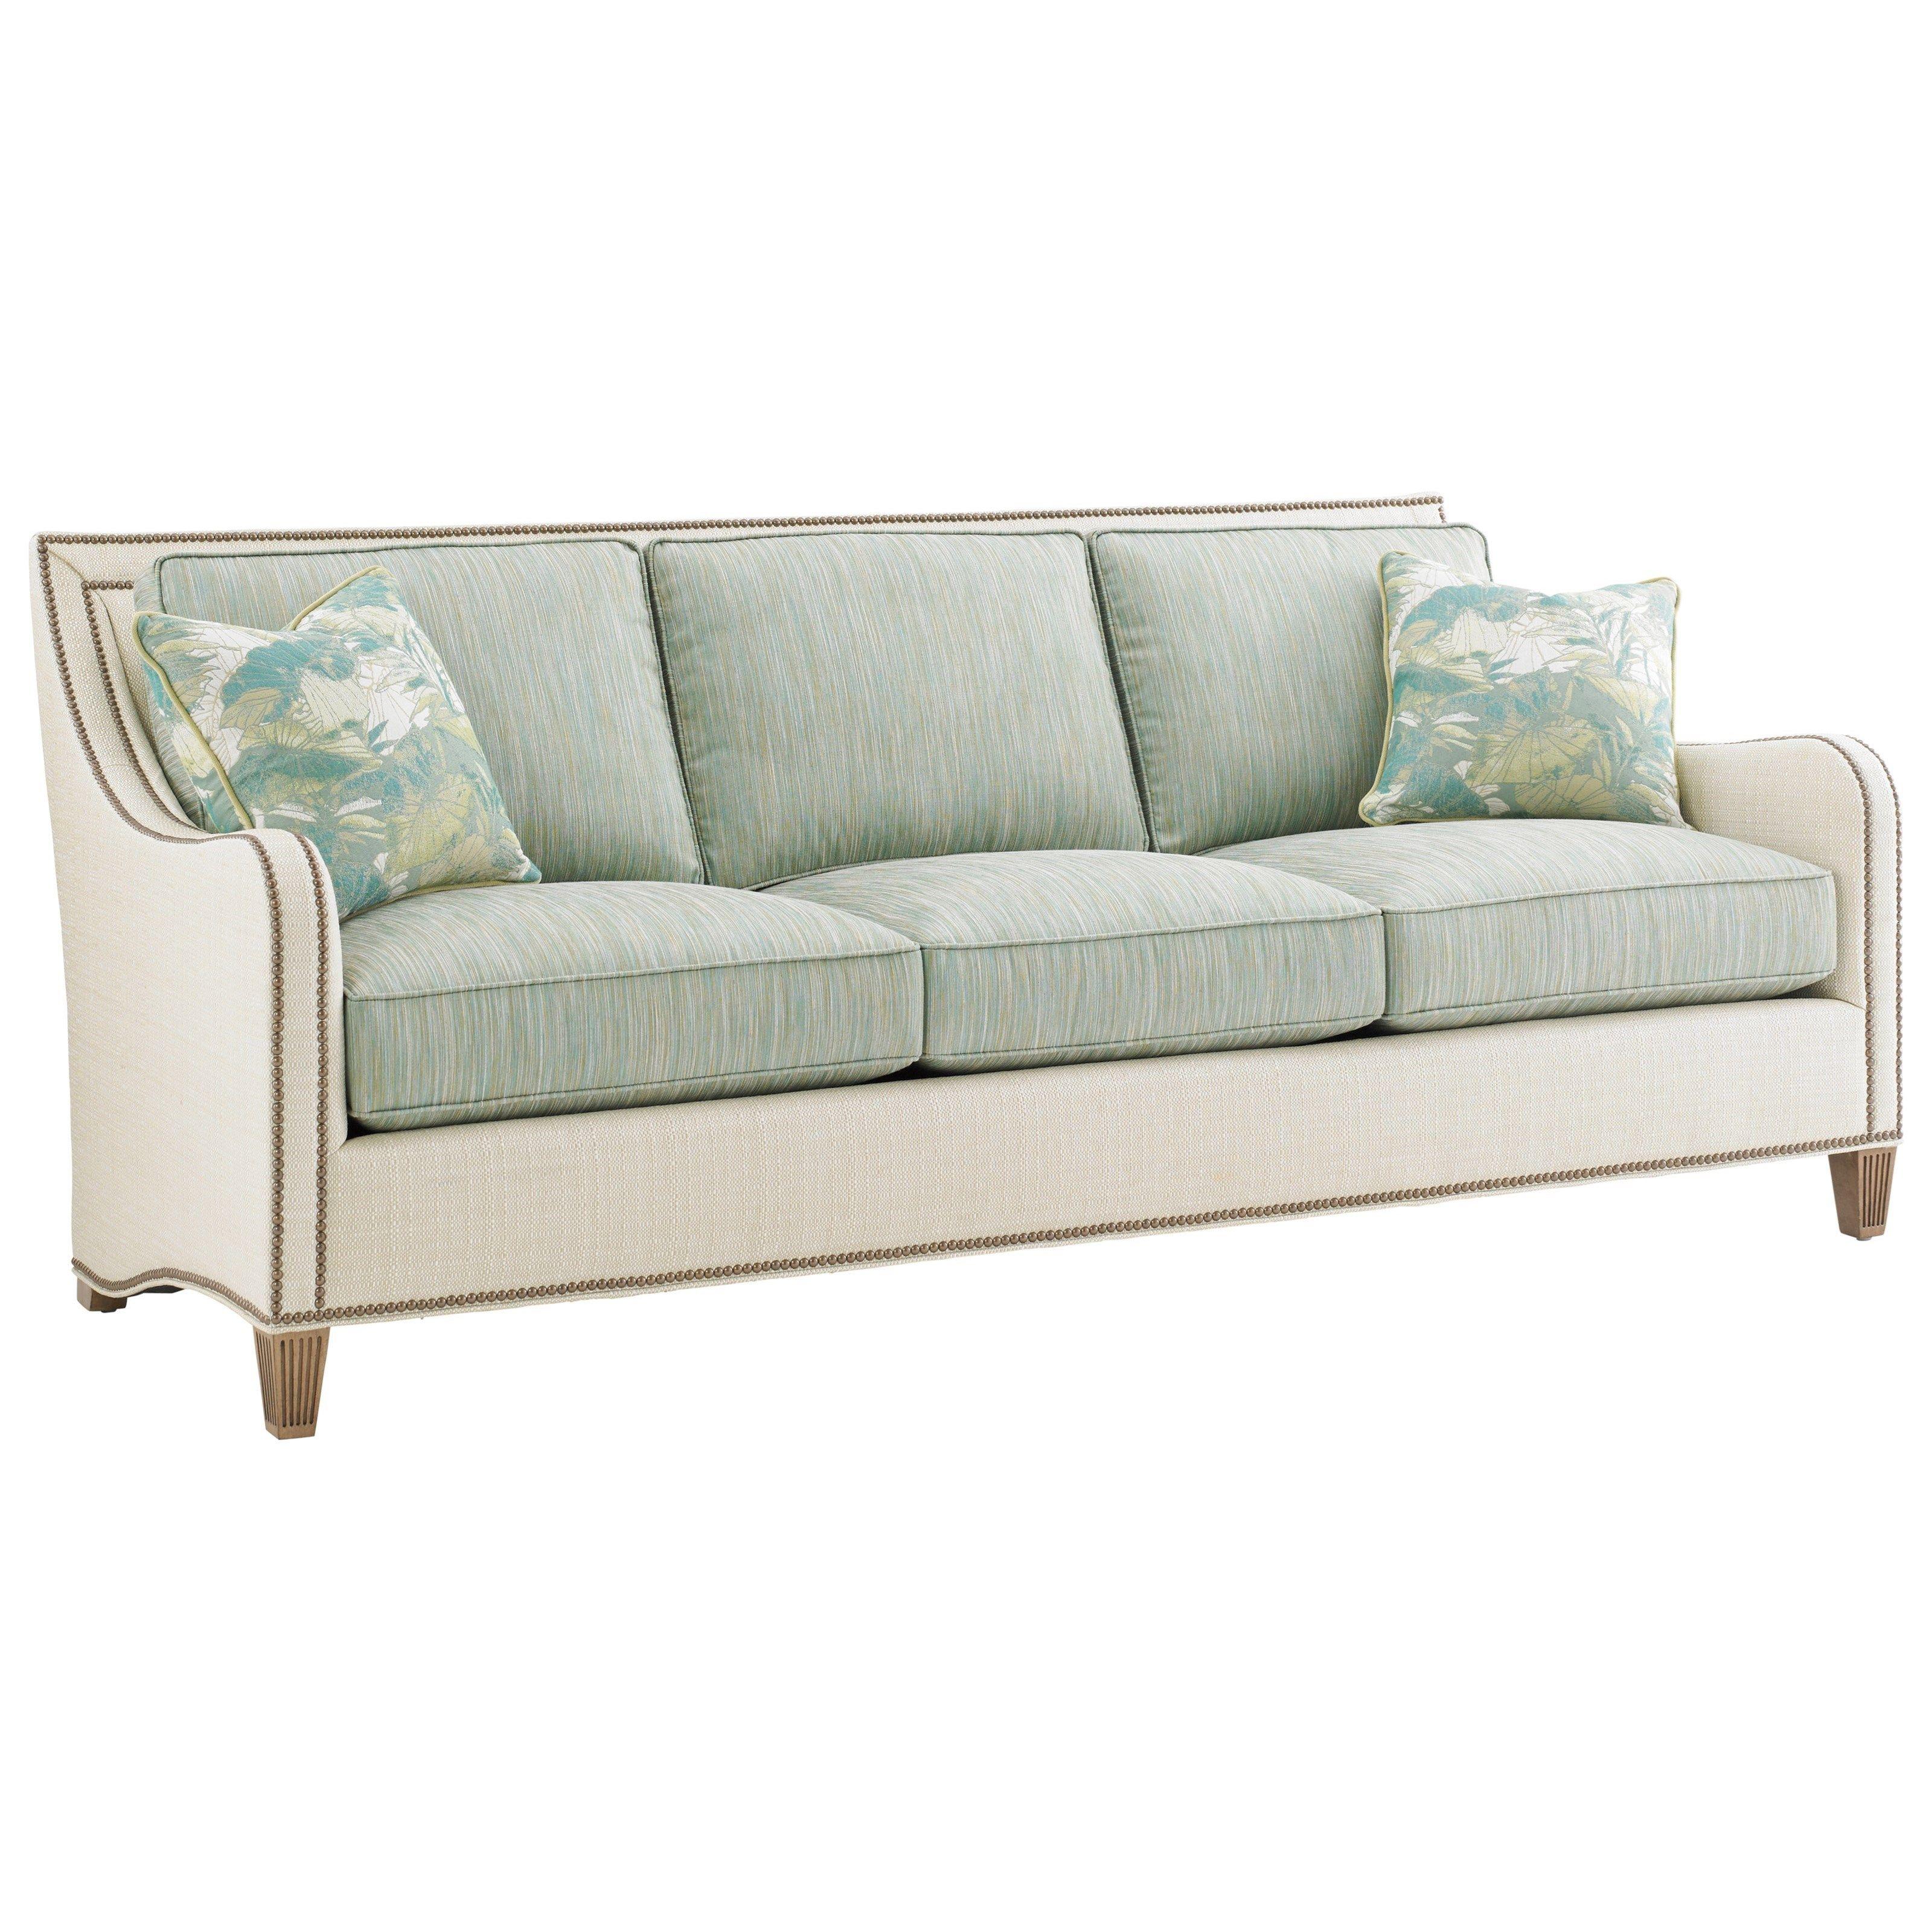 Twin Palms Koko Sofa By Tommy Bahama Home At Baeru0027s Furniture